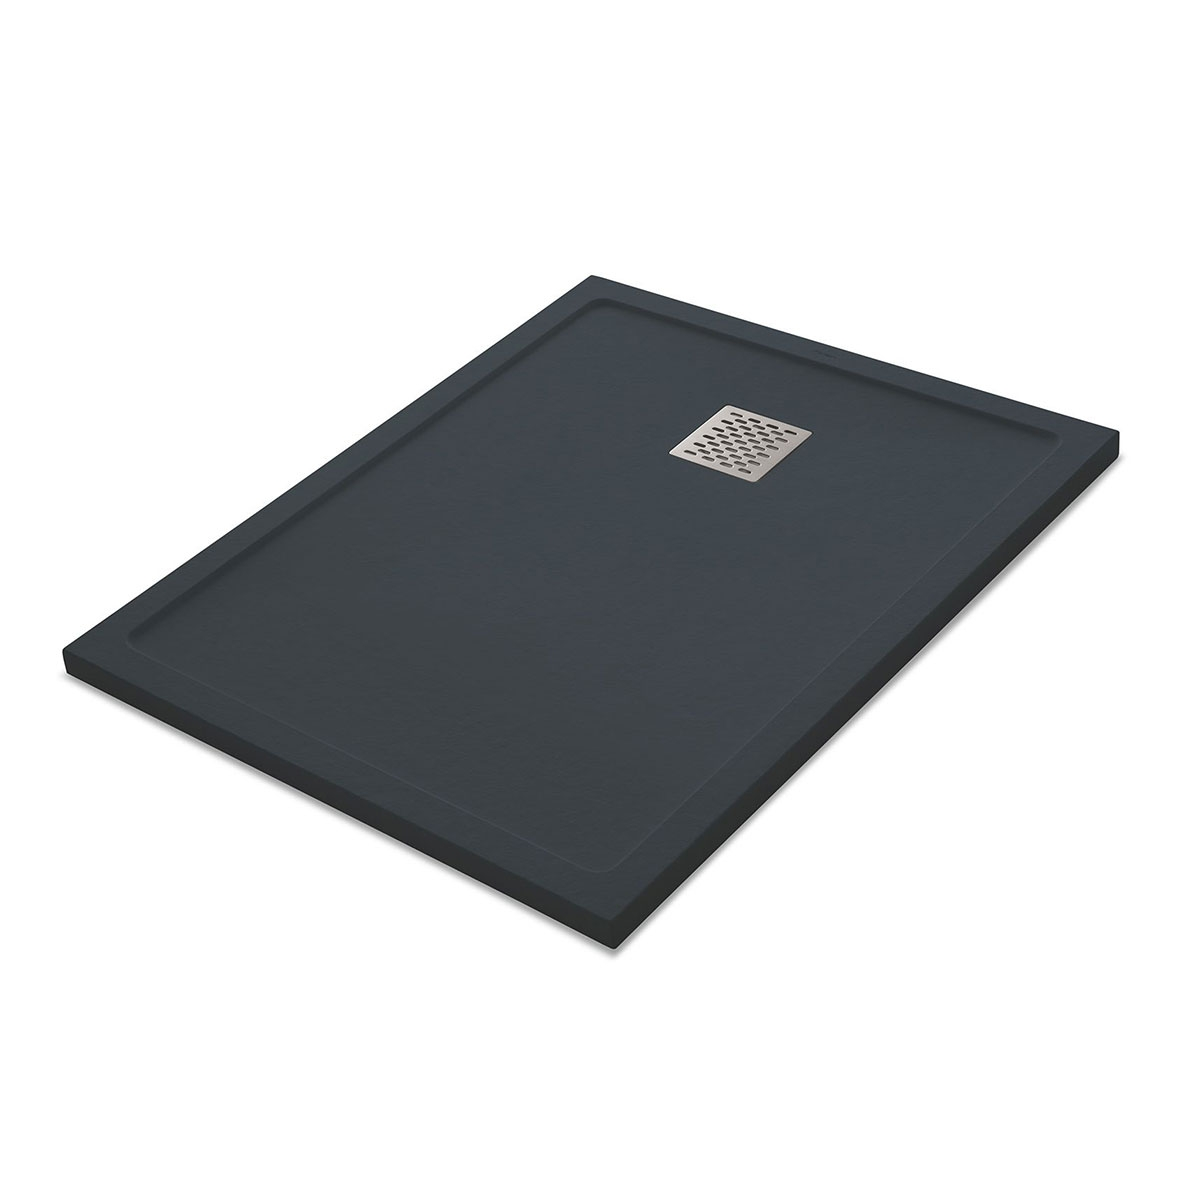 Plato de ducha rectangular 100x80 Ares Stone Nox Antracita